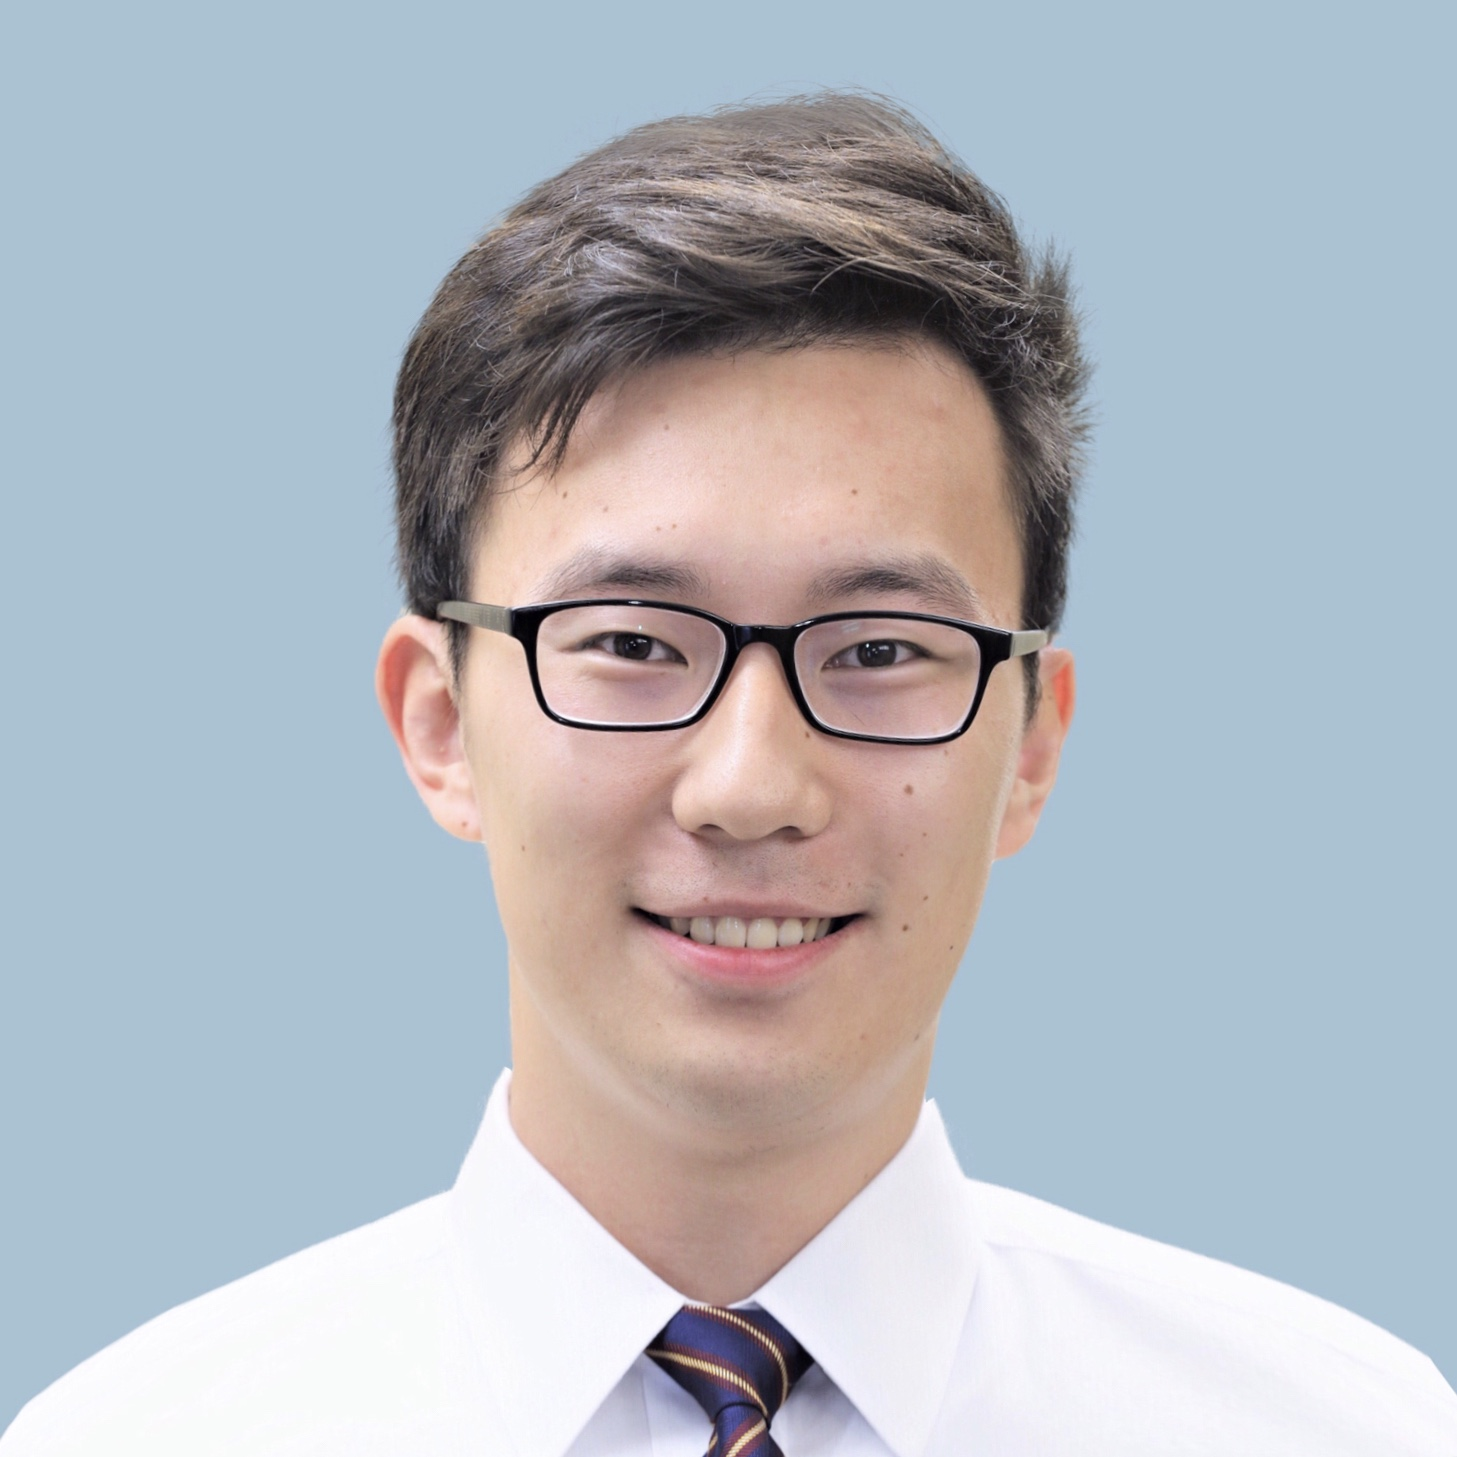 IMG_9822, Zhou, Haoran Scholarship Winner.jpg